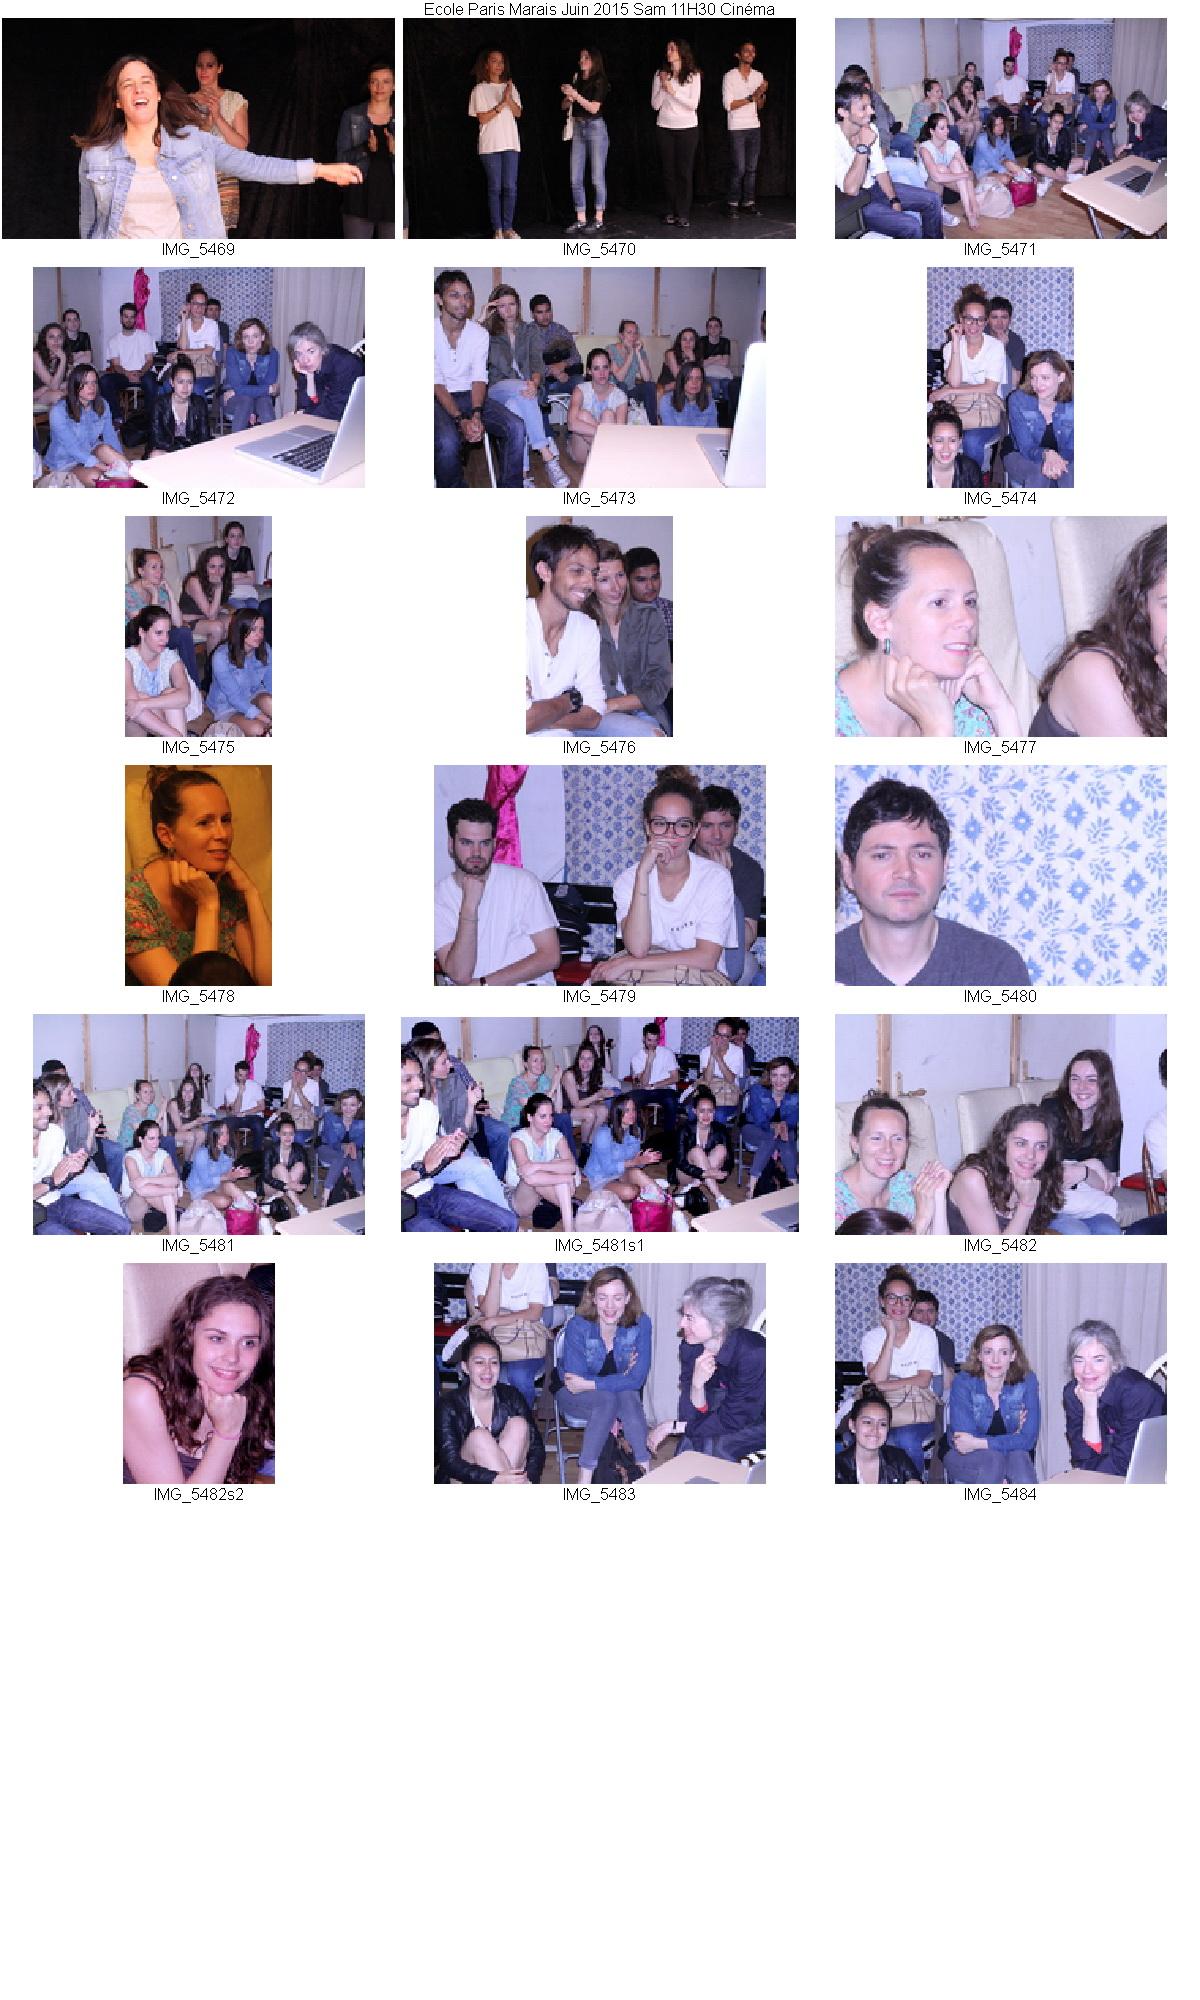 Flickr - planche contact adulte cine juin 201510